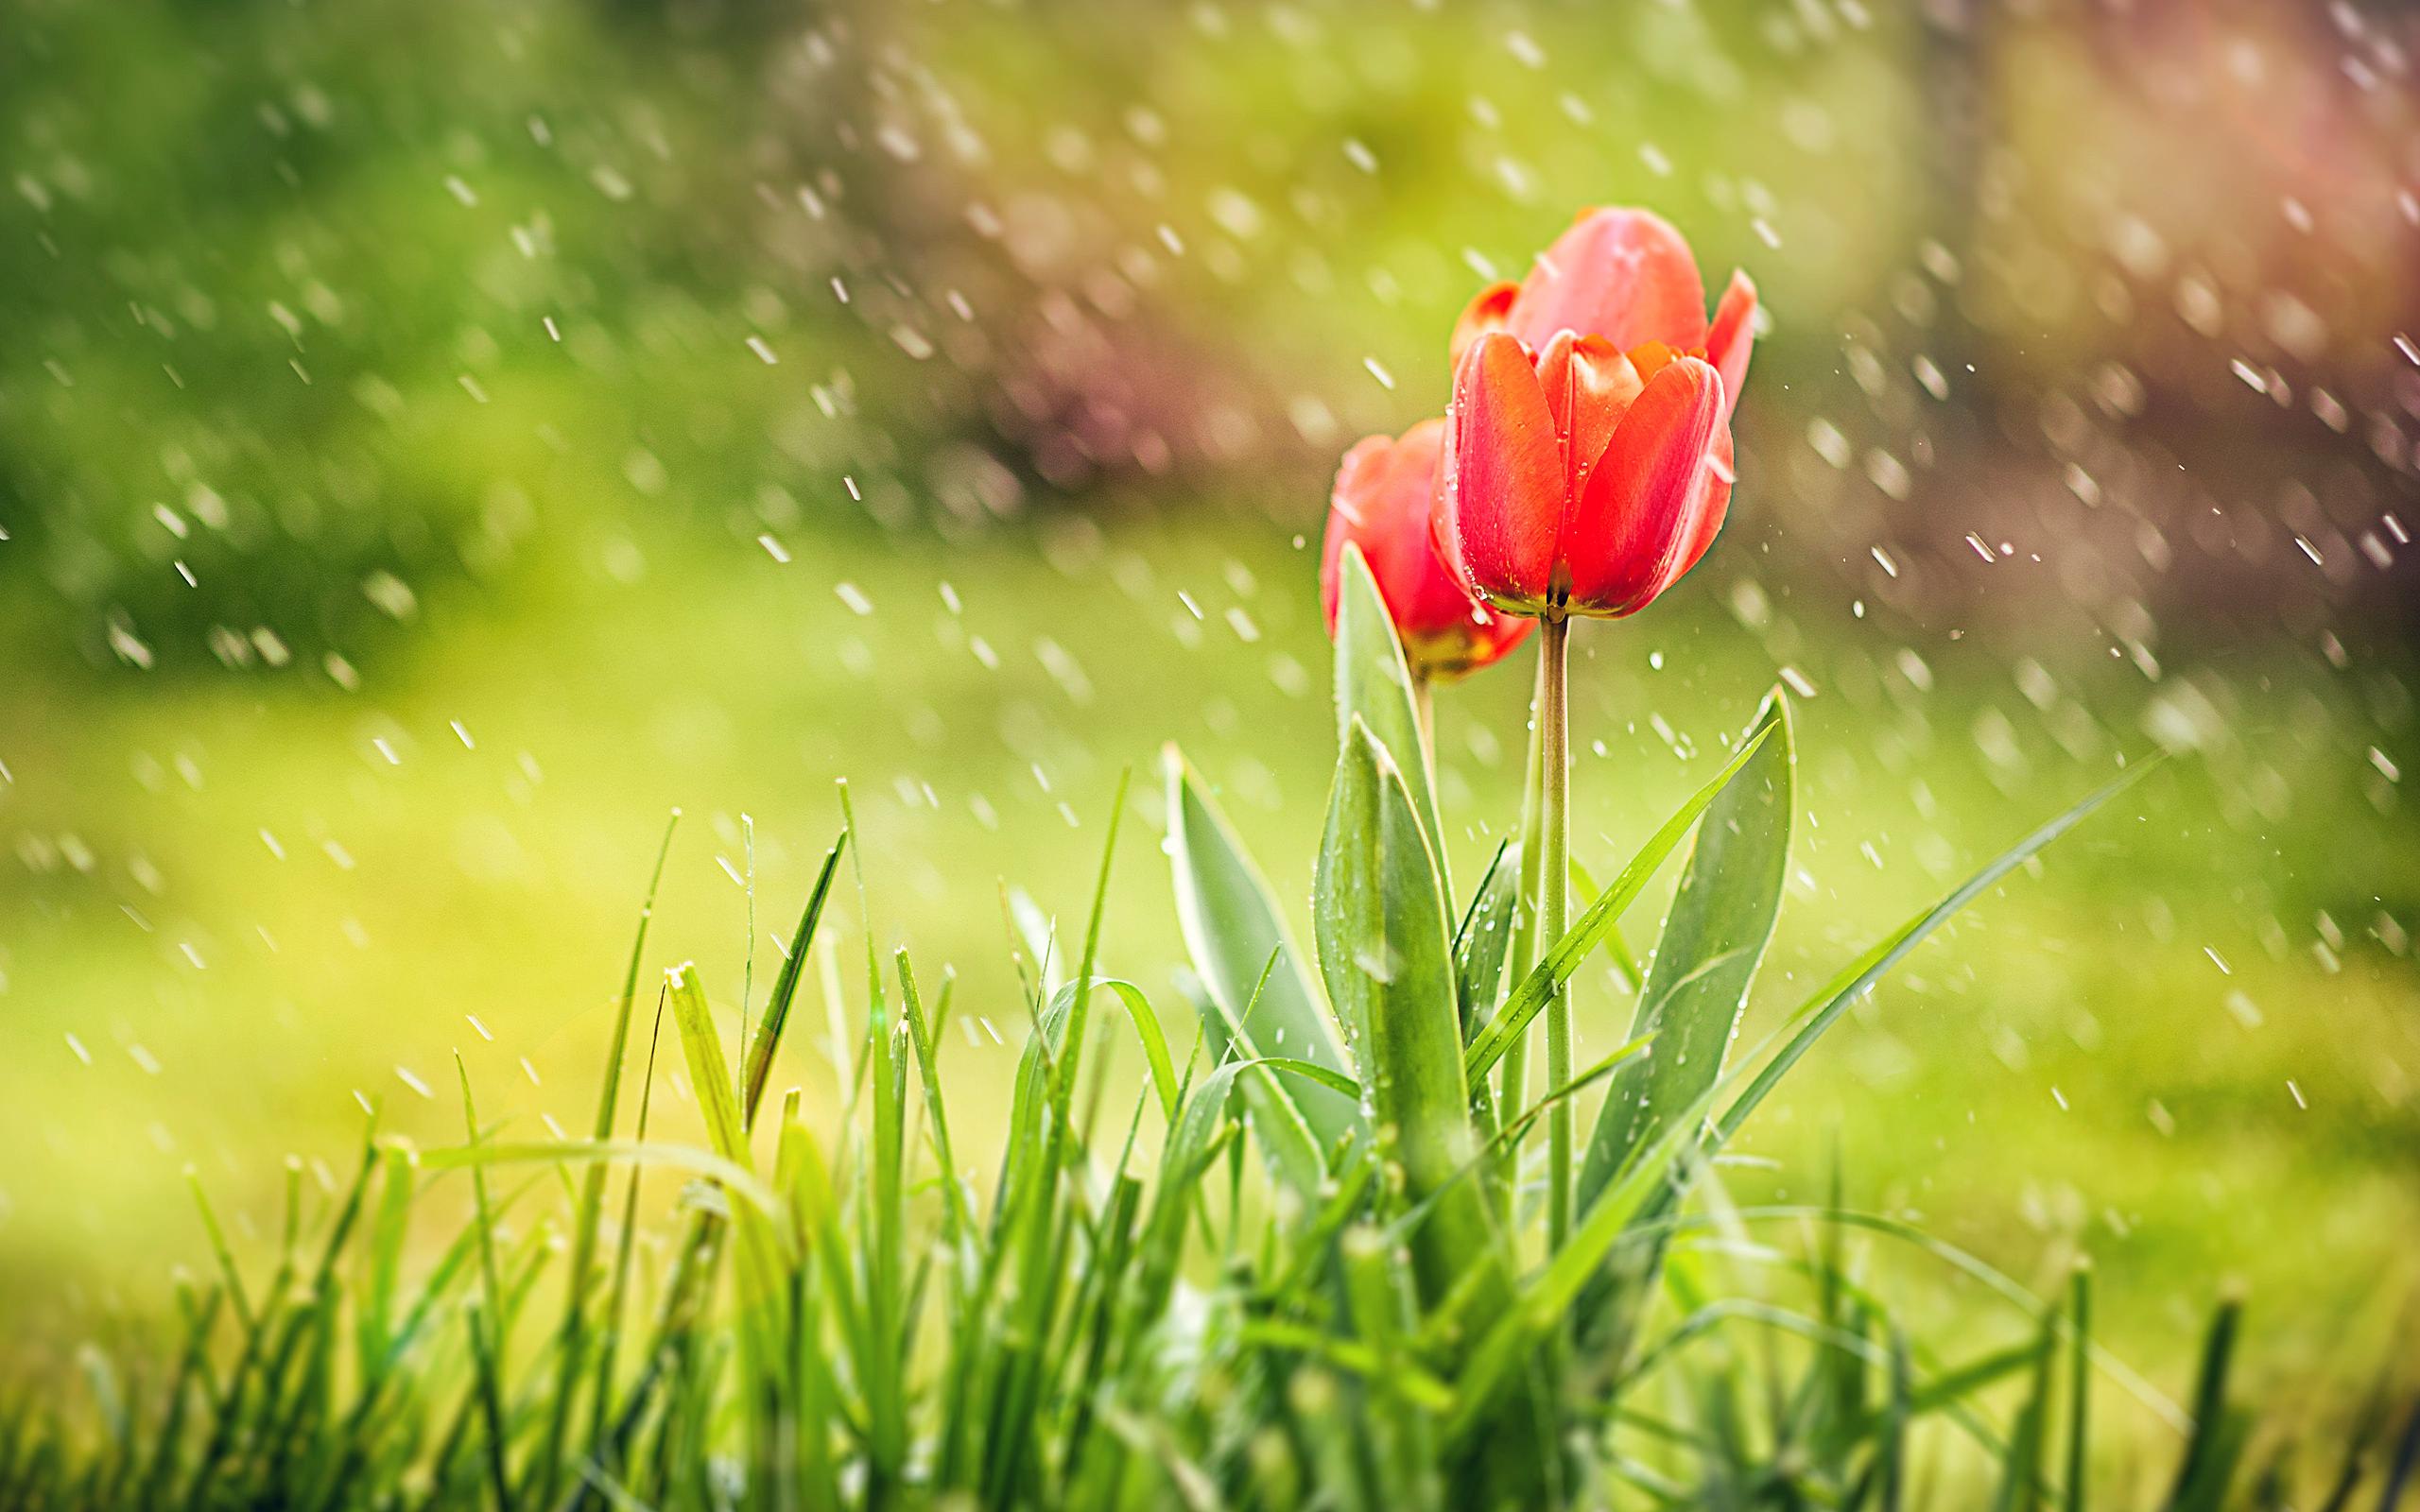 red_tulip_rain-wallpaper